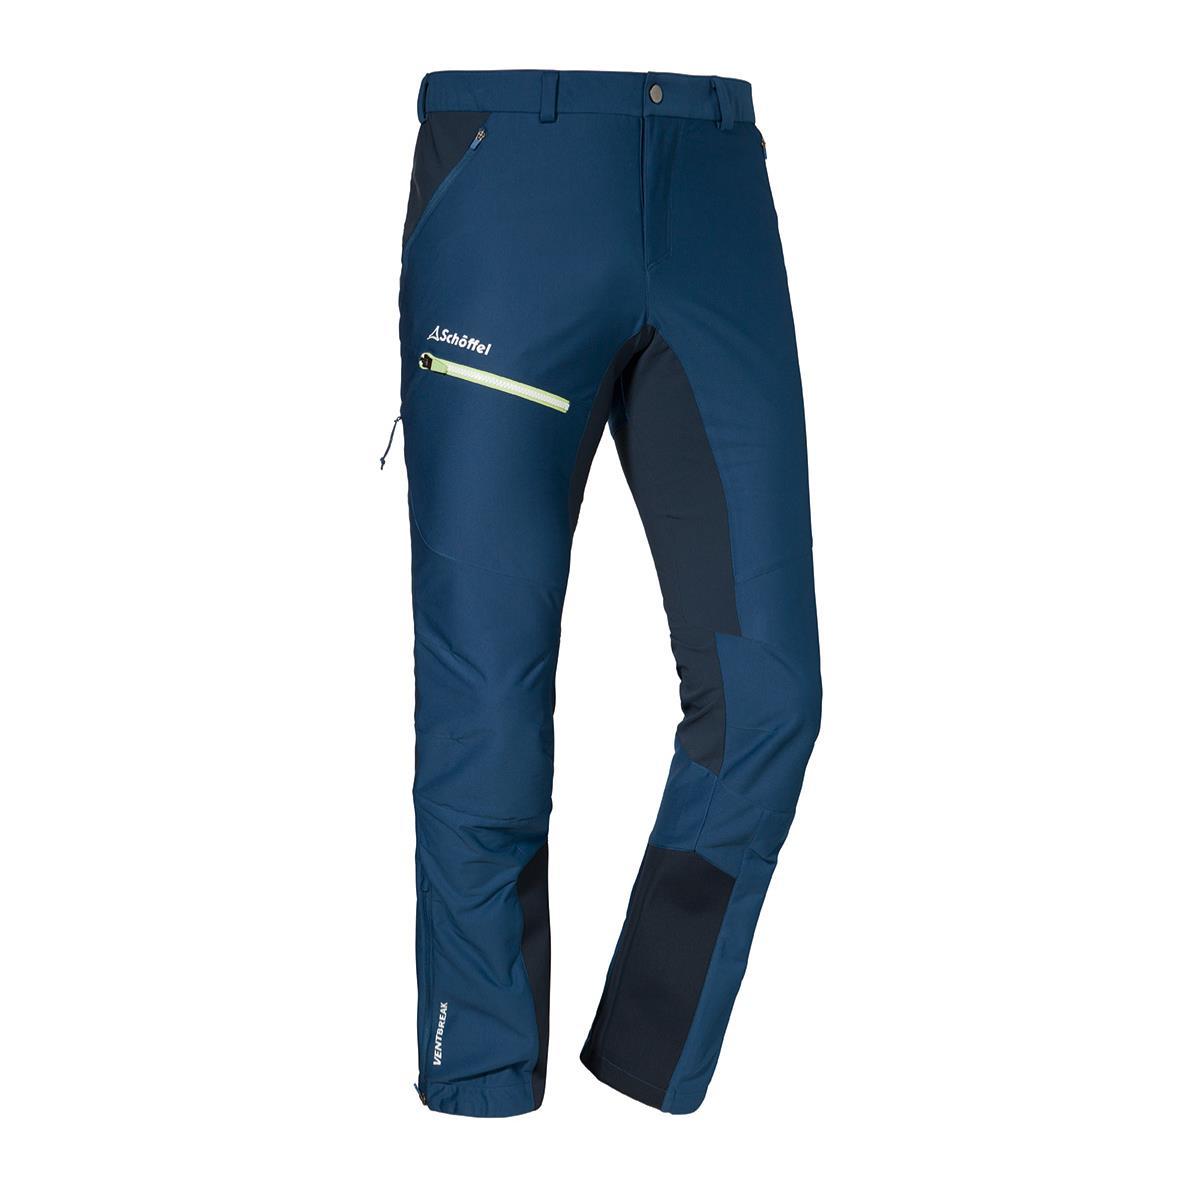 Schöffel Val d Isere Softshell Pants Herren Tourenhose dunkelblau